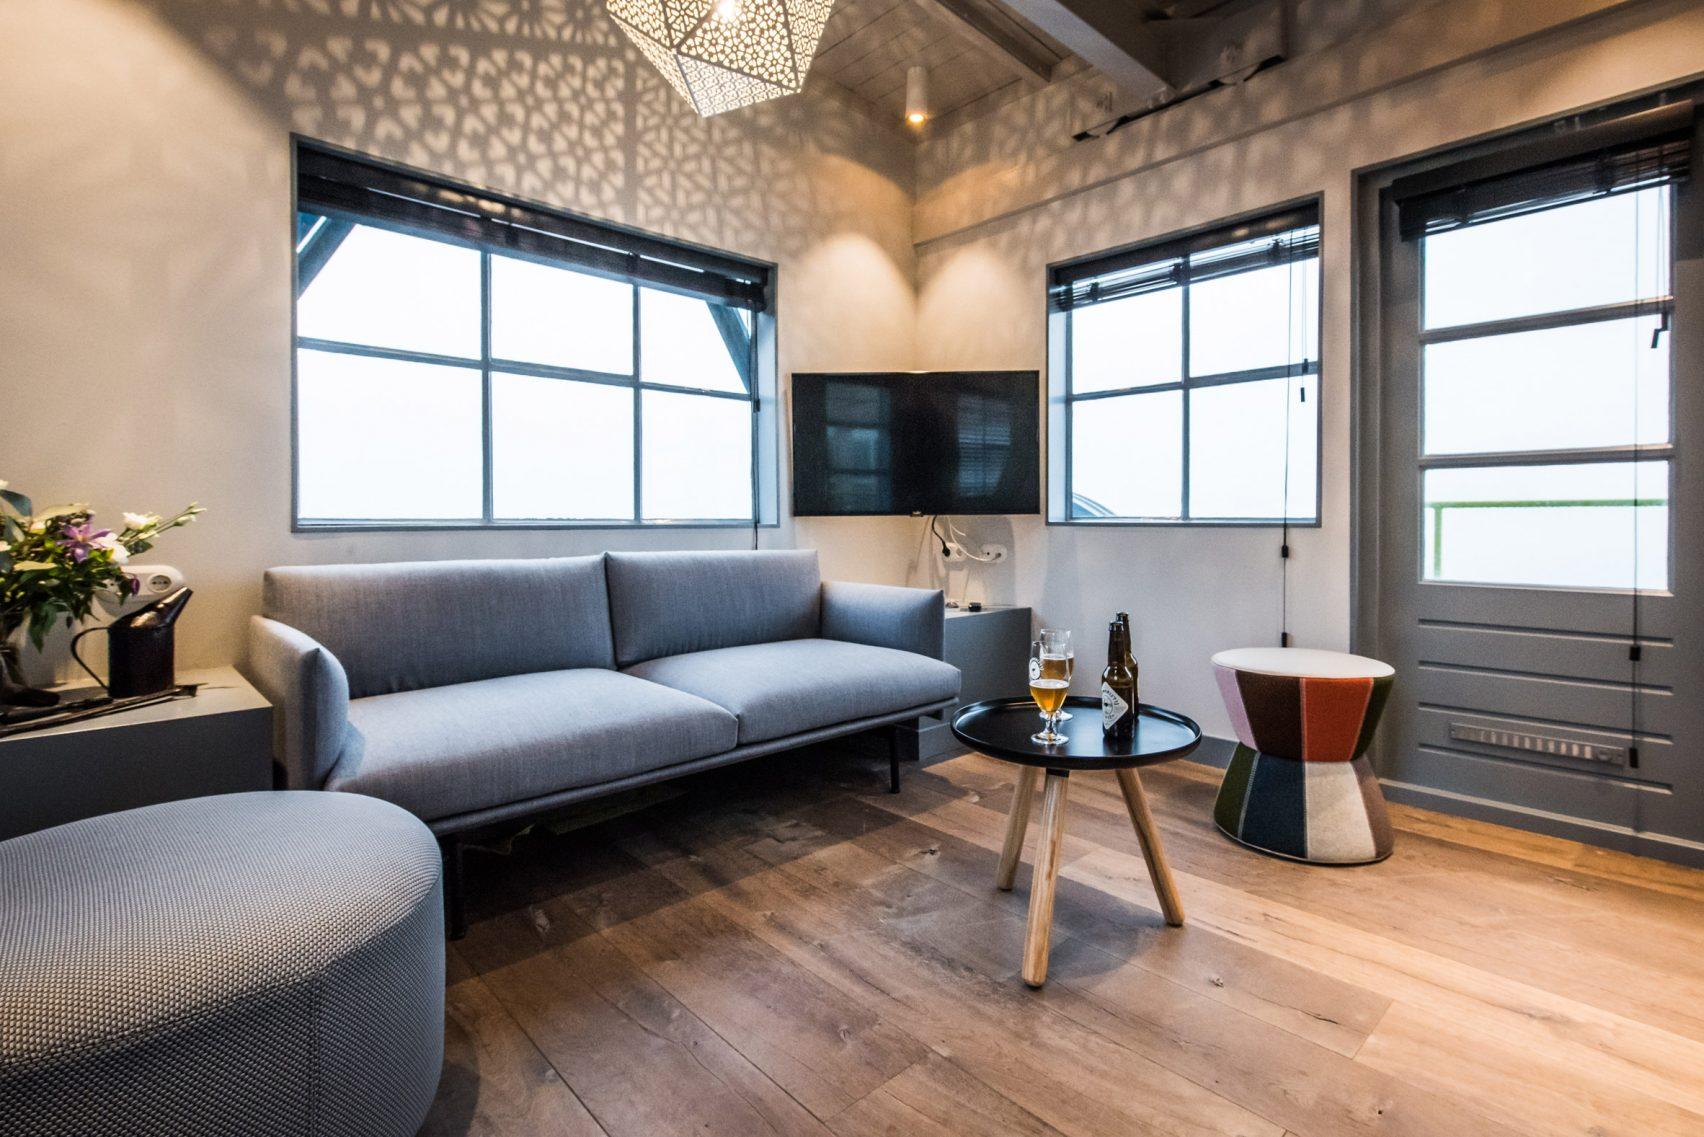 yays-crane-apartment-edward-van-vliet-architecture-interiors-netherlands_dezeen_2364_col_6-1704x1137